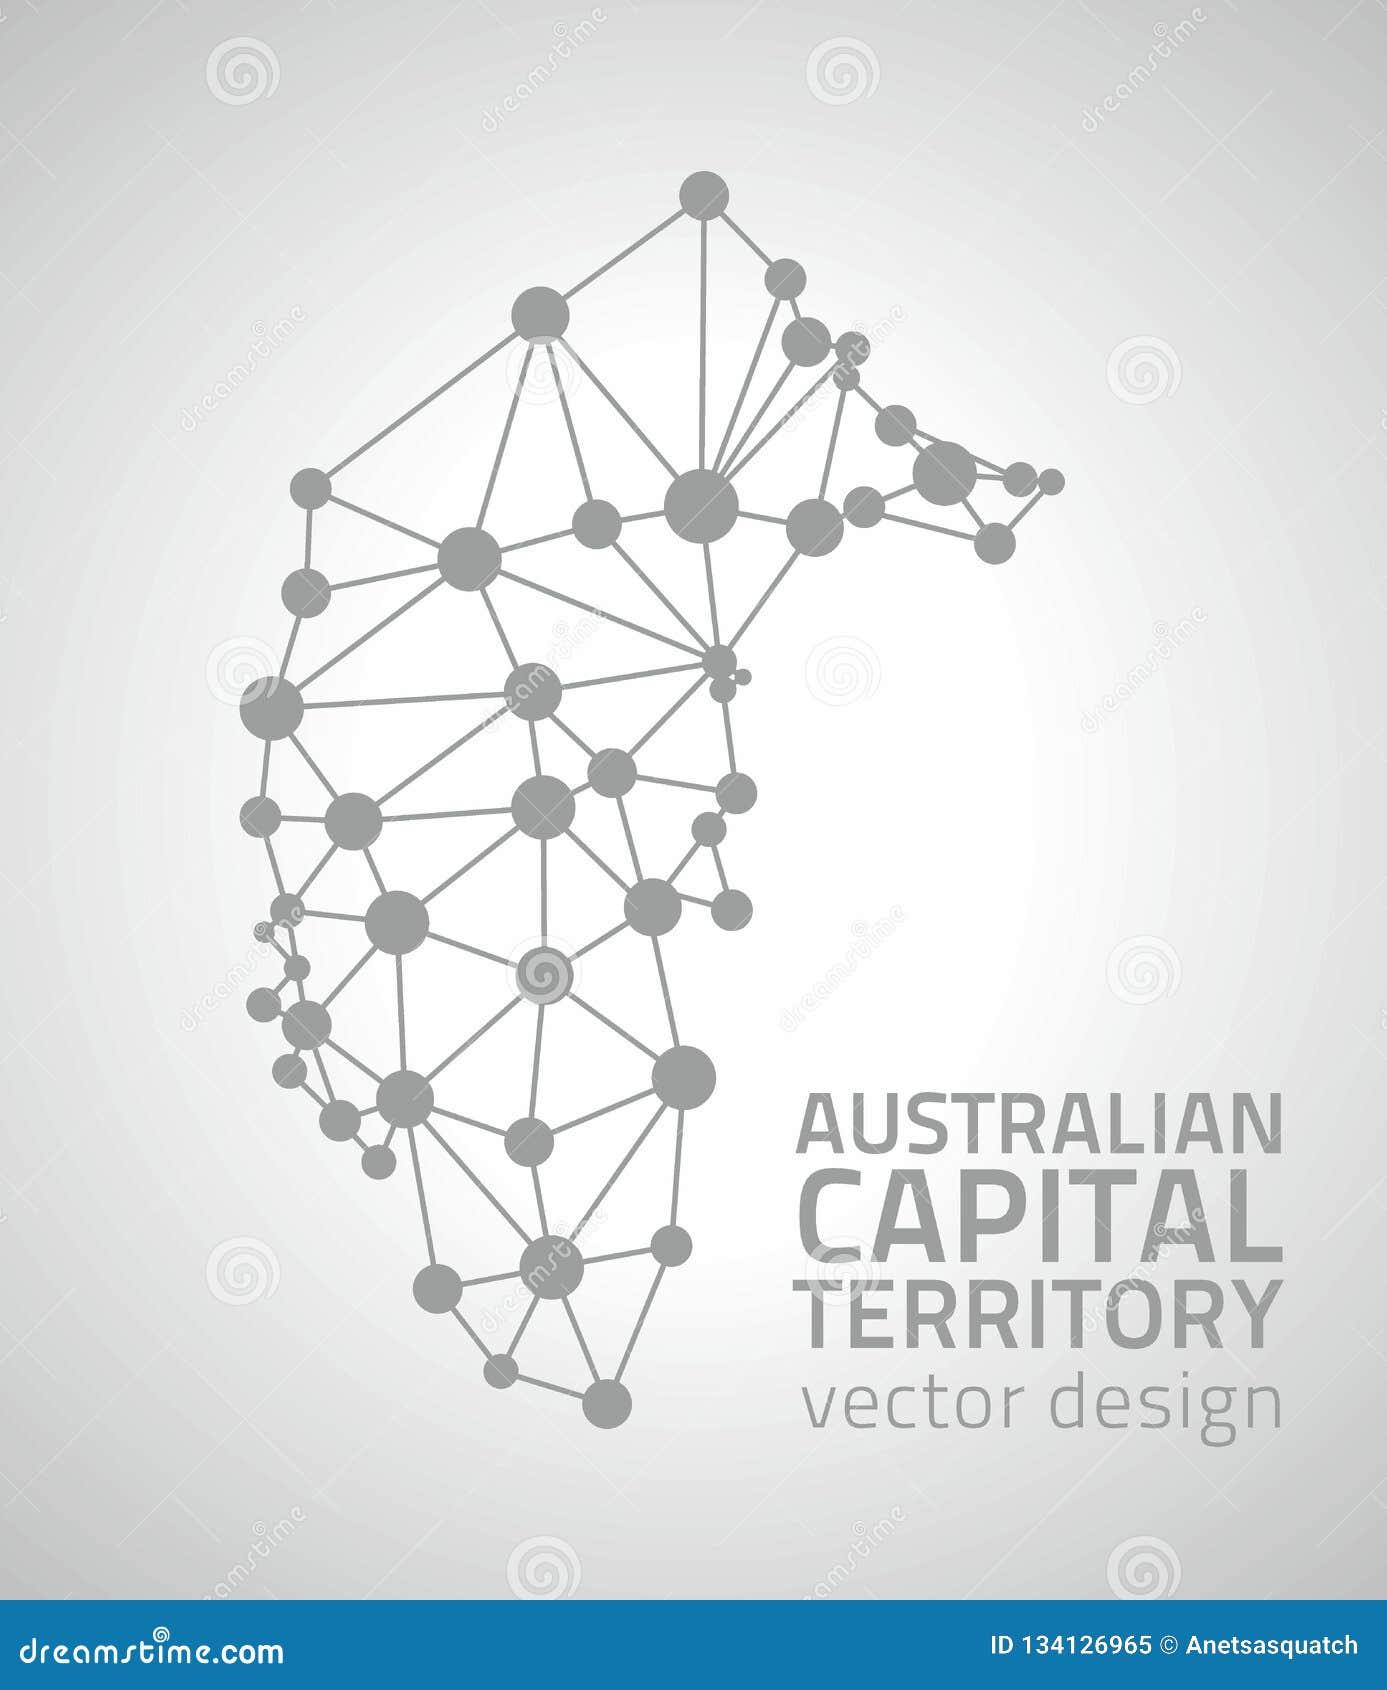 Australian Capital Territory grey dot outline vector triangle map